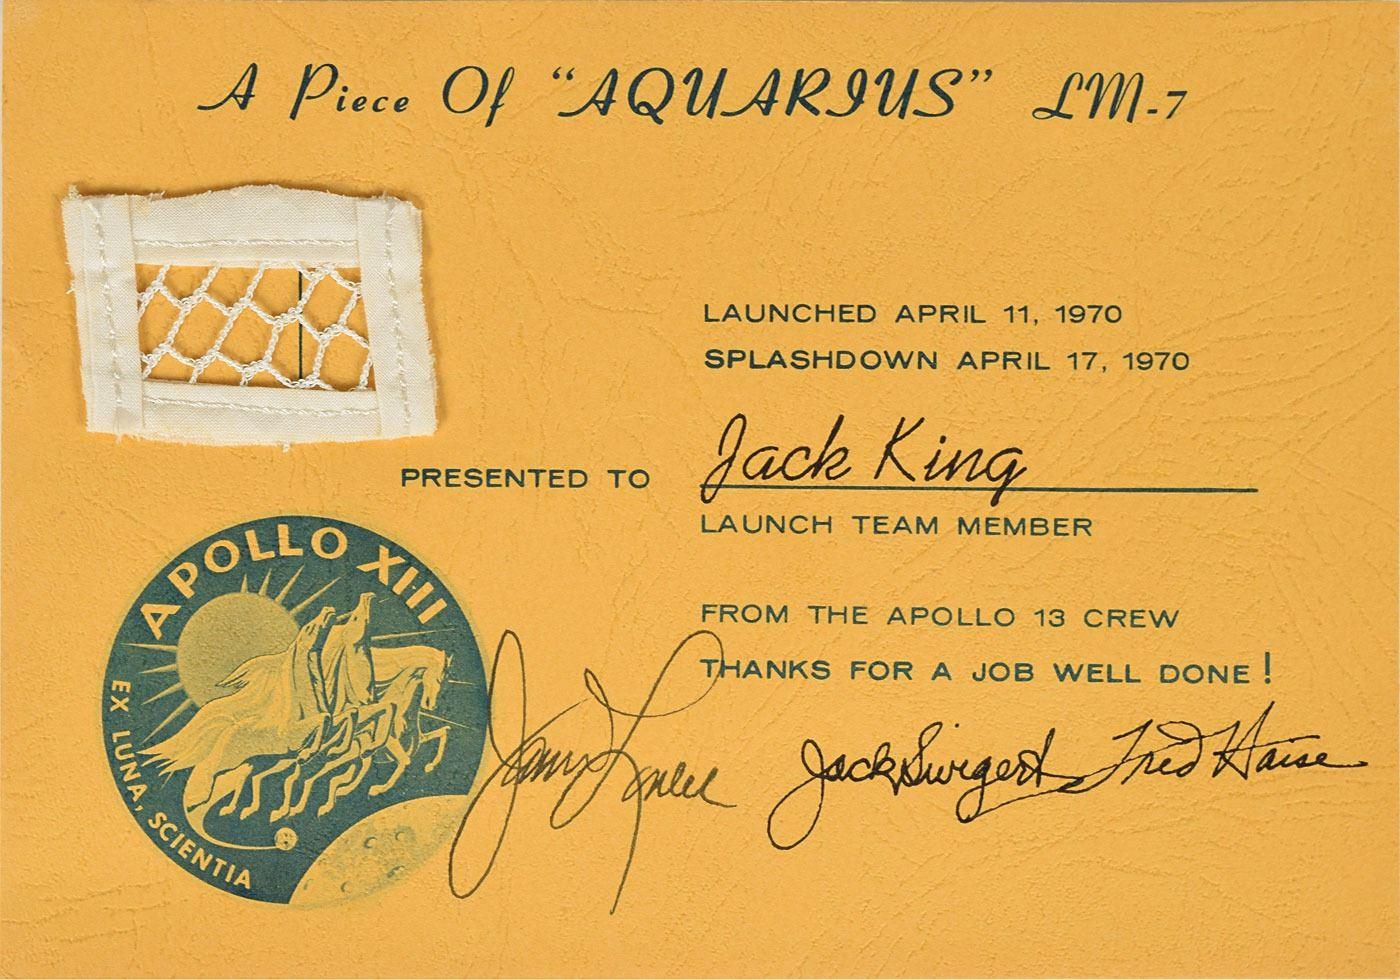 Apollo 13 Crew-Signed Flown Lunar Module Netting